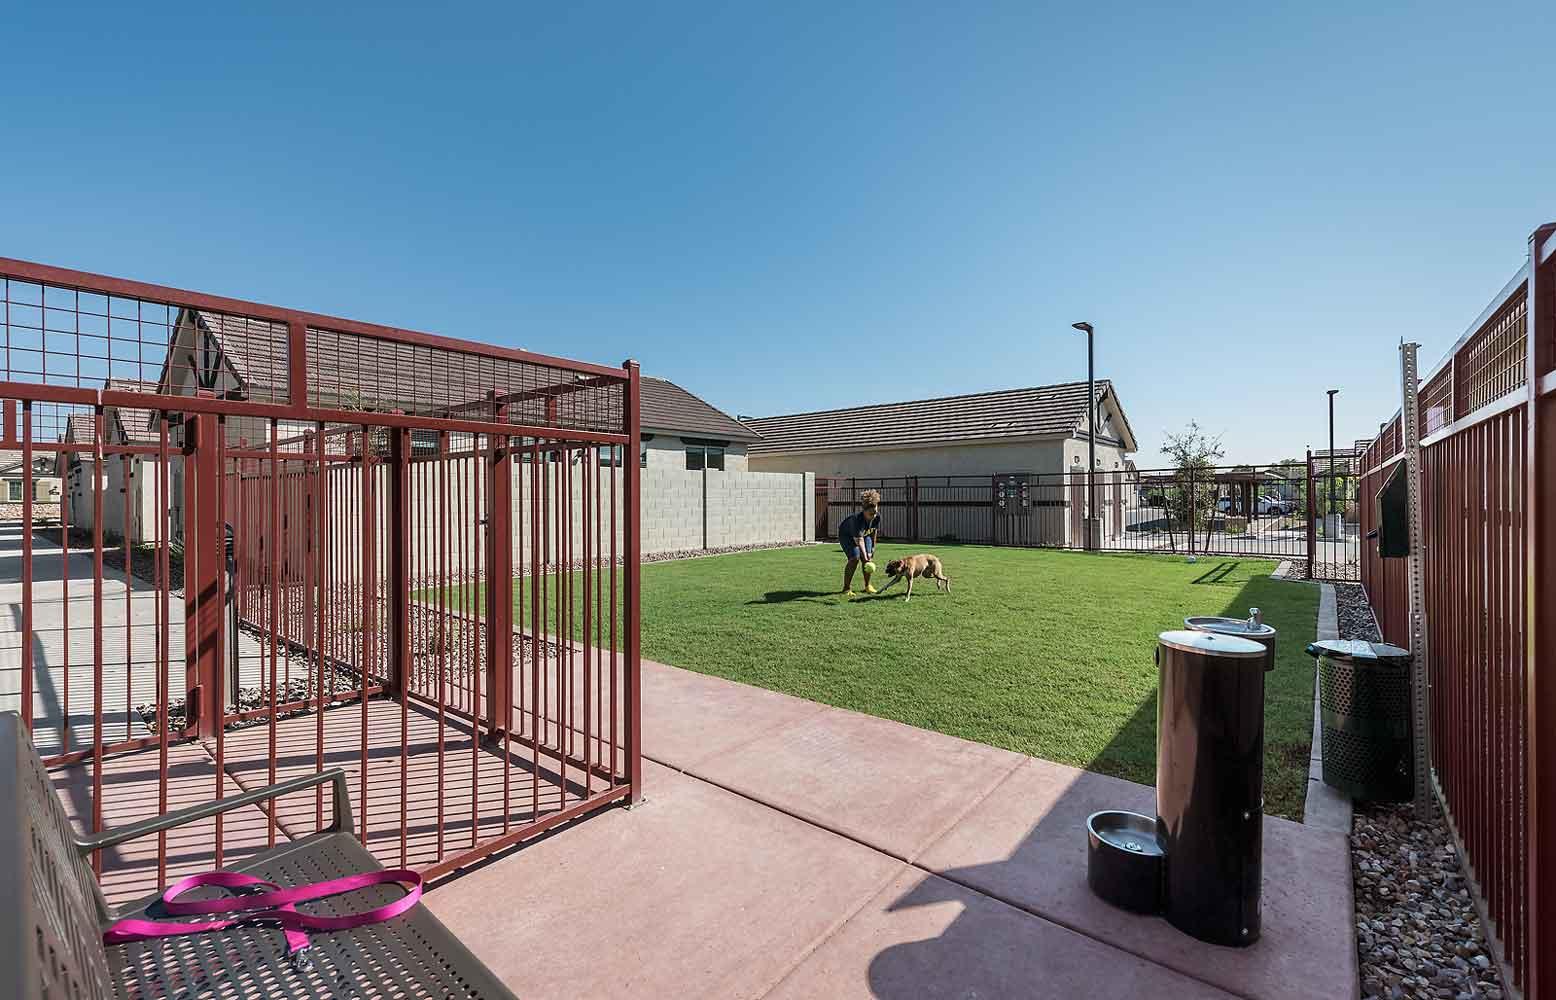 Gated Community at Harvard Crossing Apartments in Goodyear, AZ